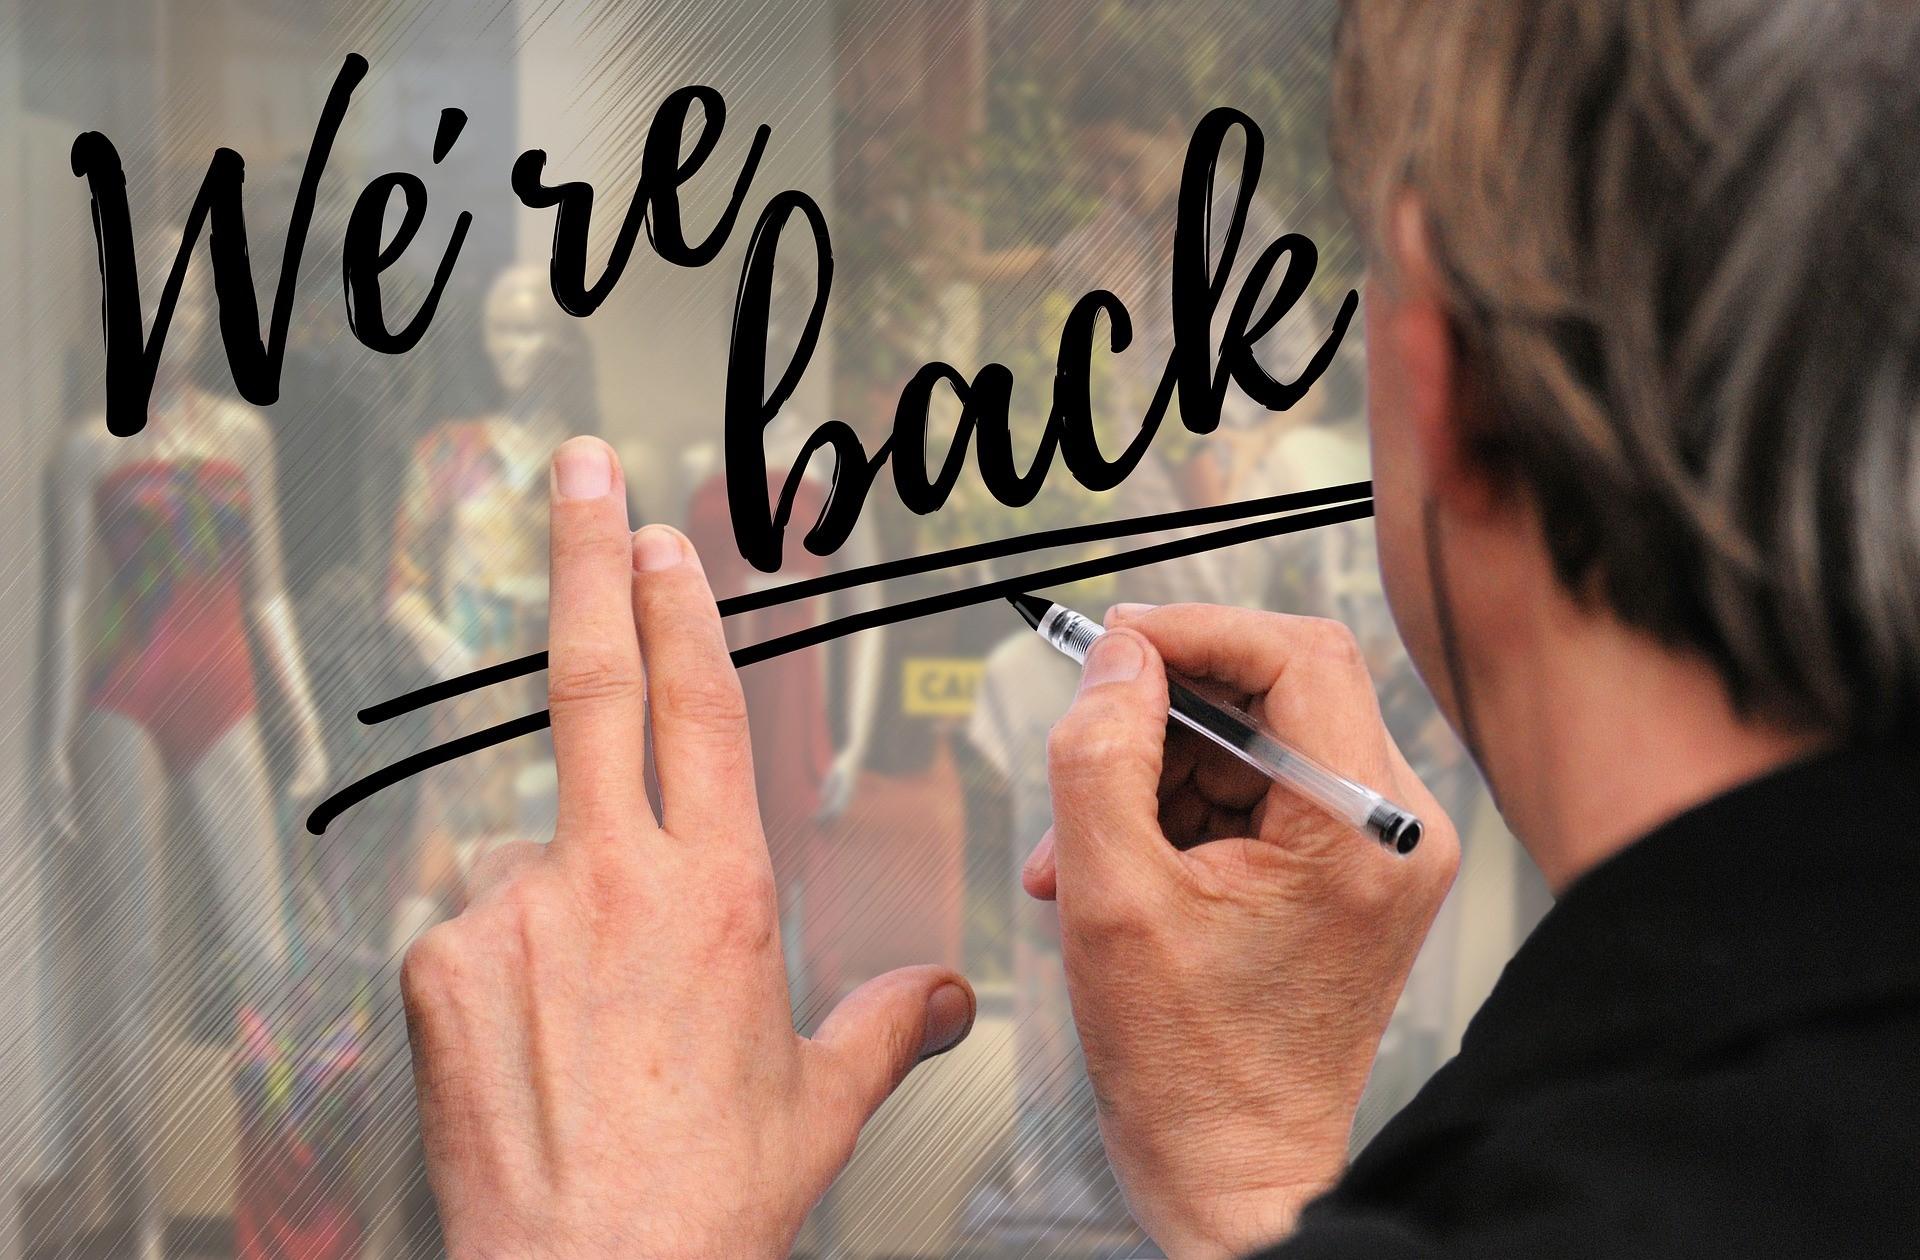 NFIB-Survey: We will back image